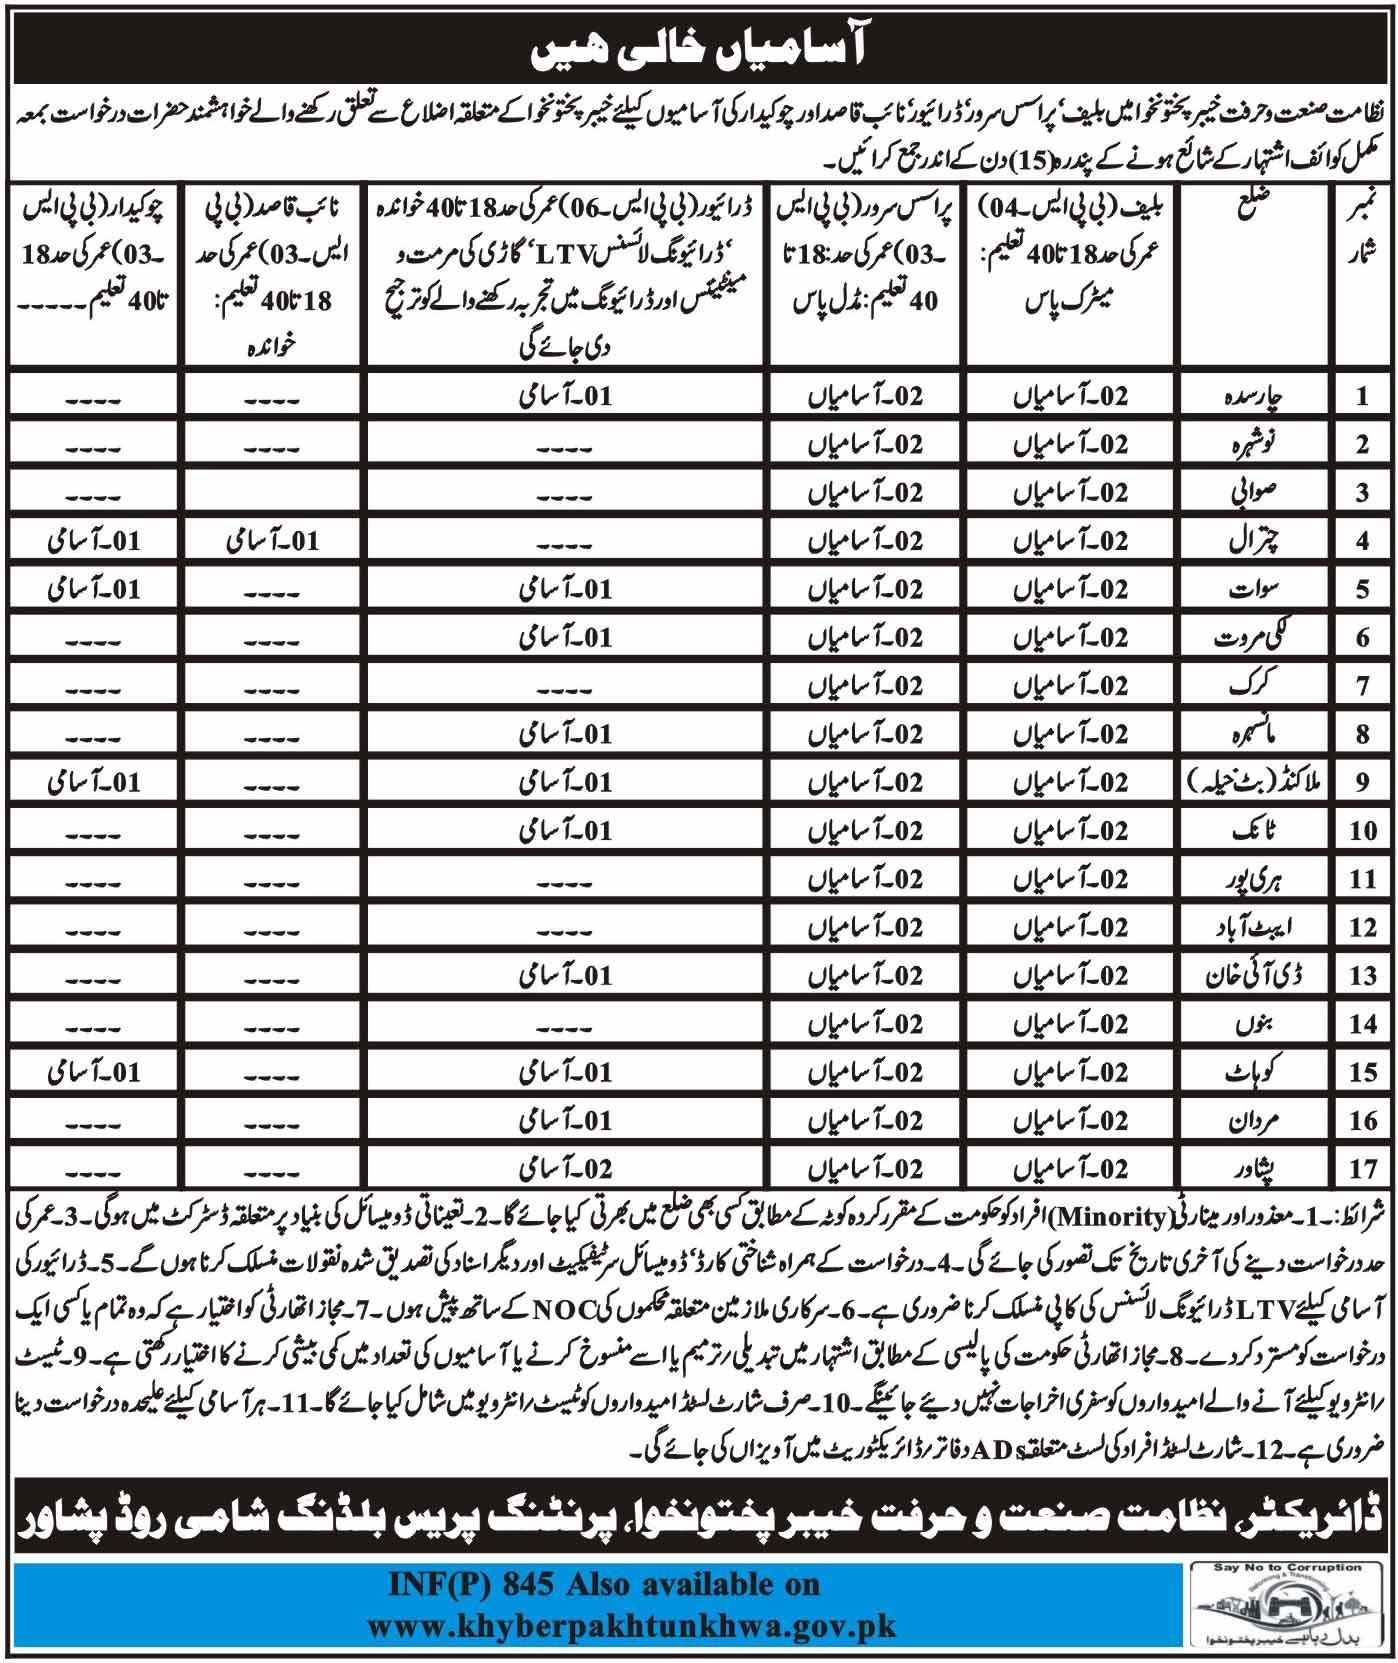 Industries Department KPK 84 Jobs 20th February 2018 Daily Mashriq Newspaper